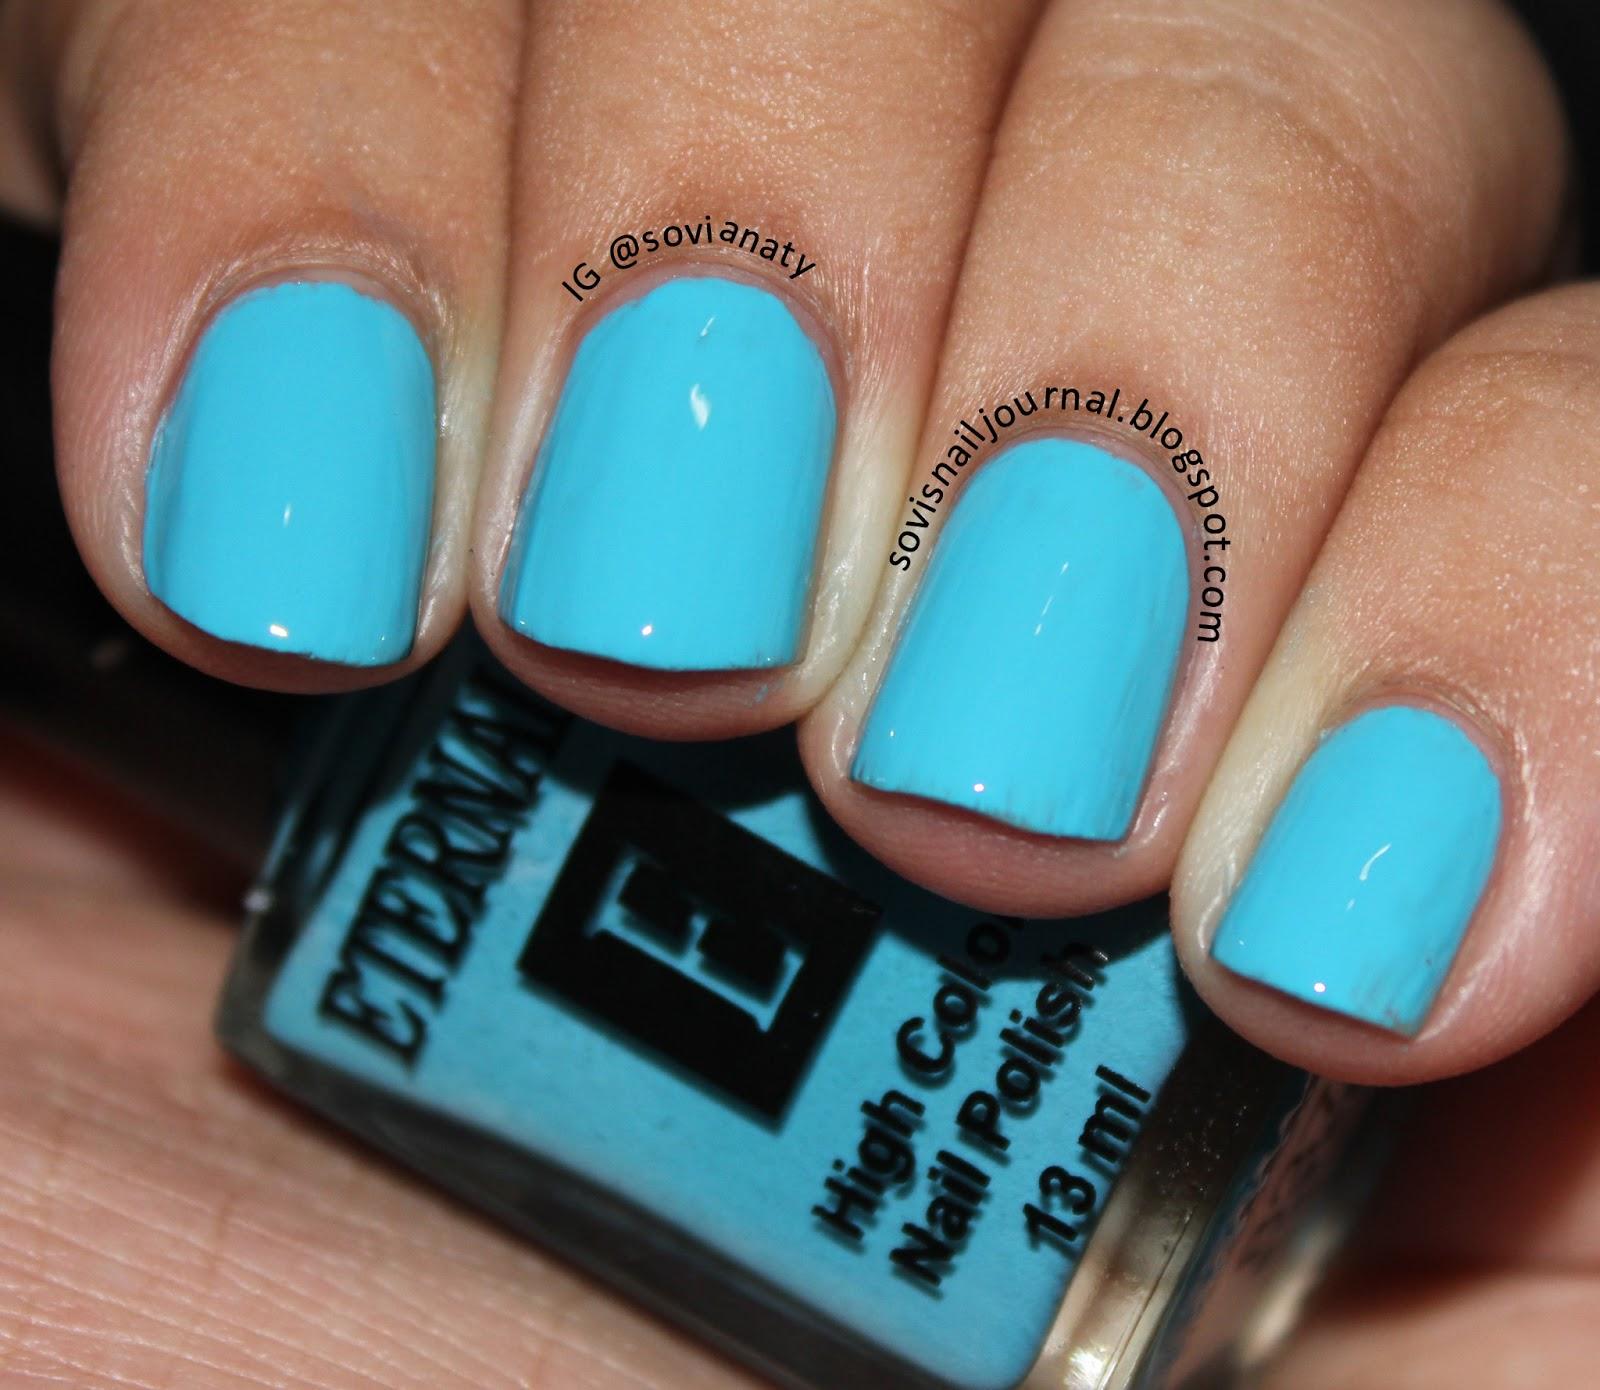 Sovi's Nail Journal: Eternally High Color Nail Polish 837